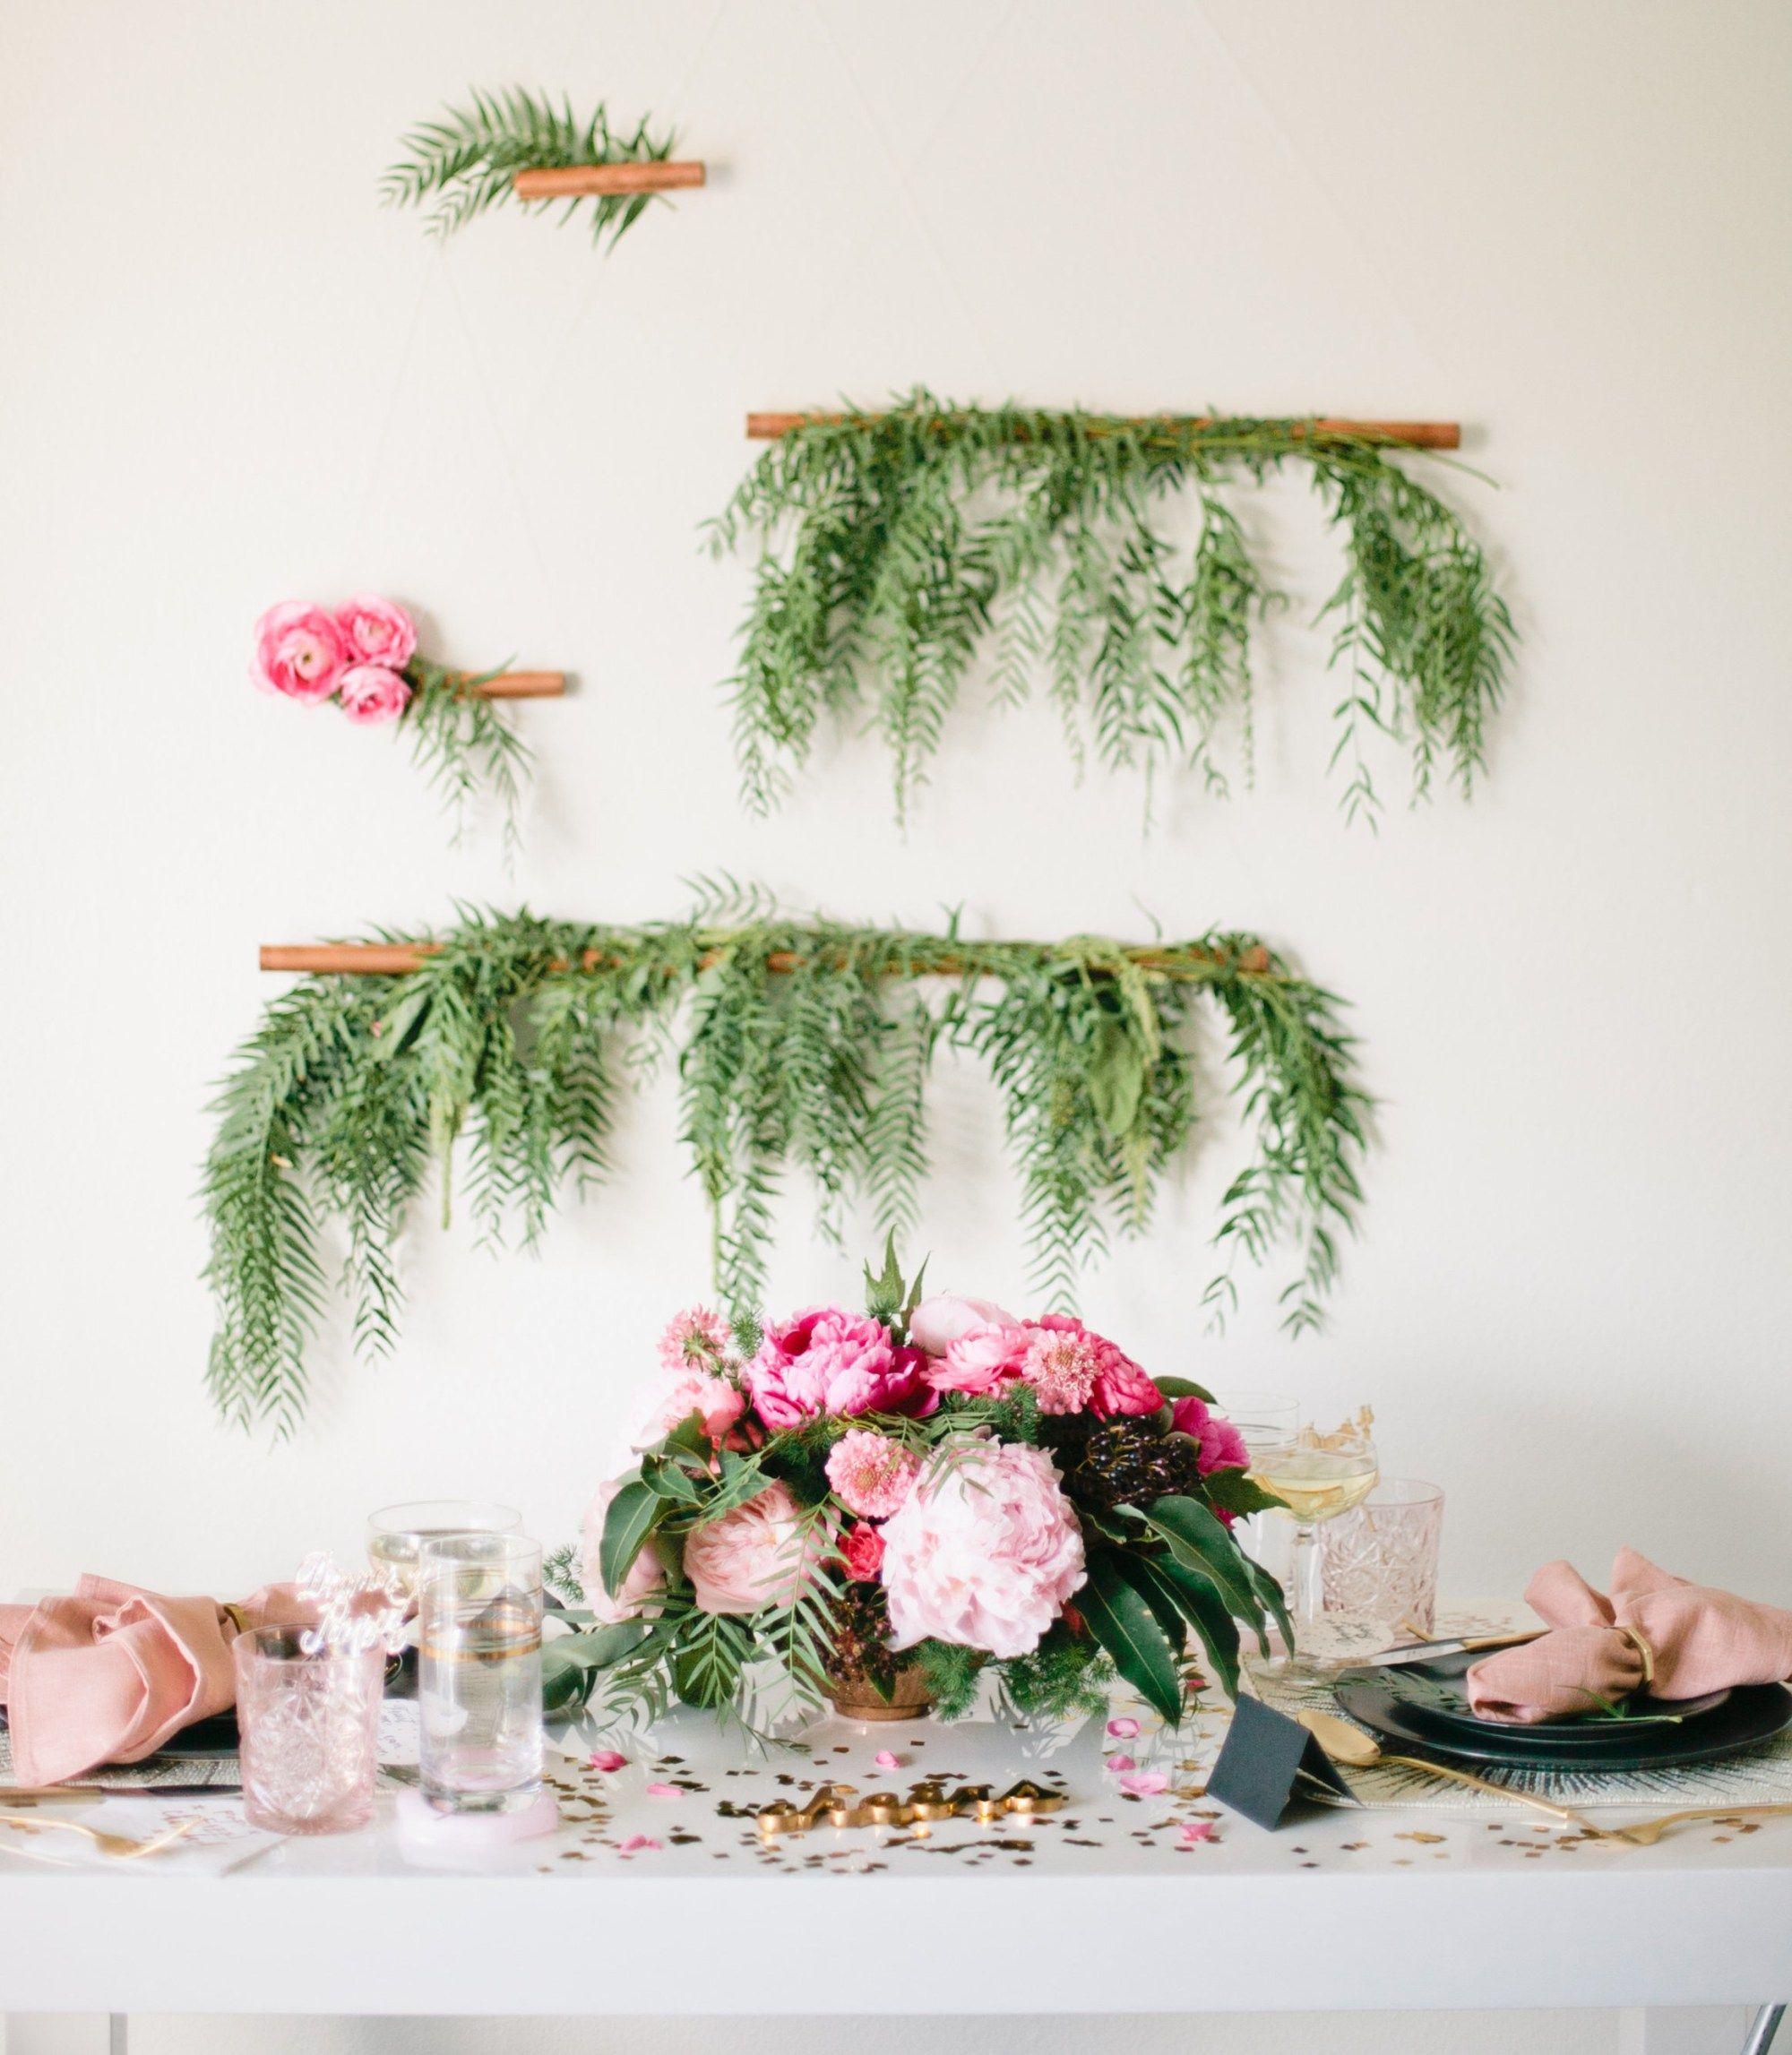 MV Florals Beijos events, New years eve dinner, Dinner